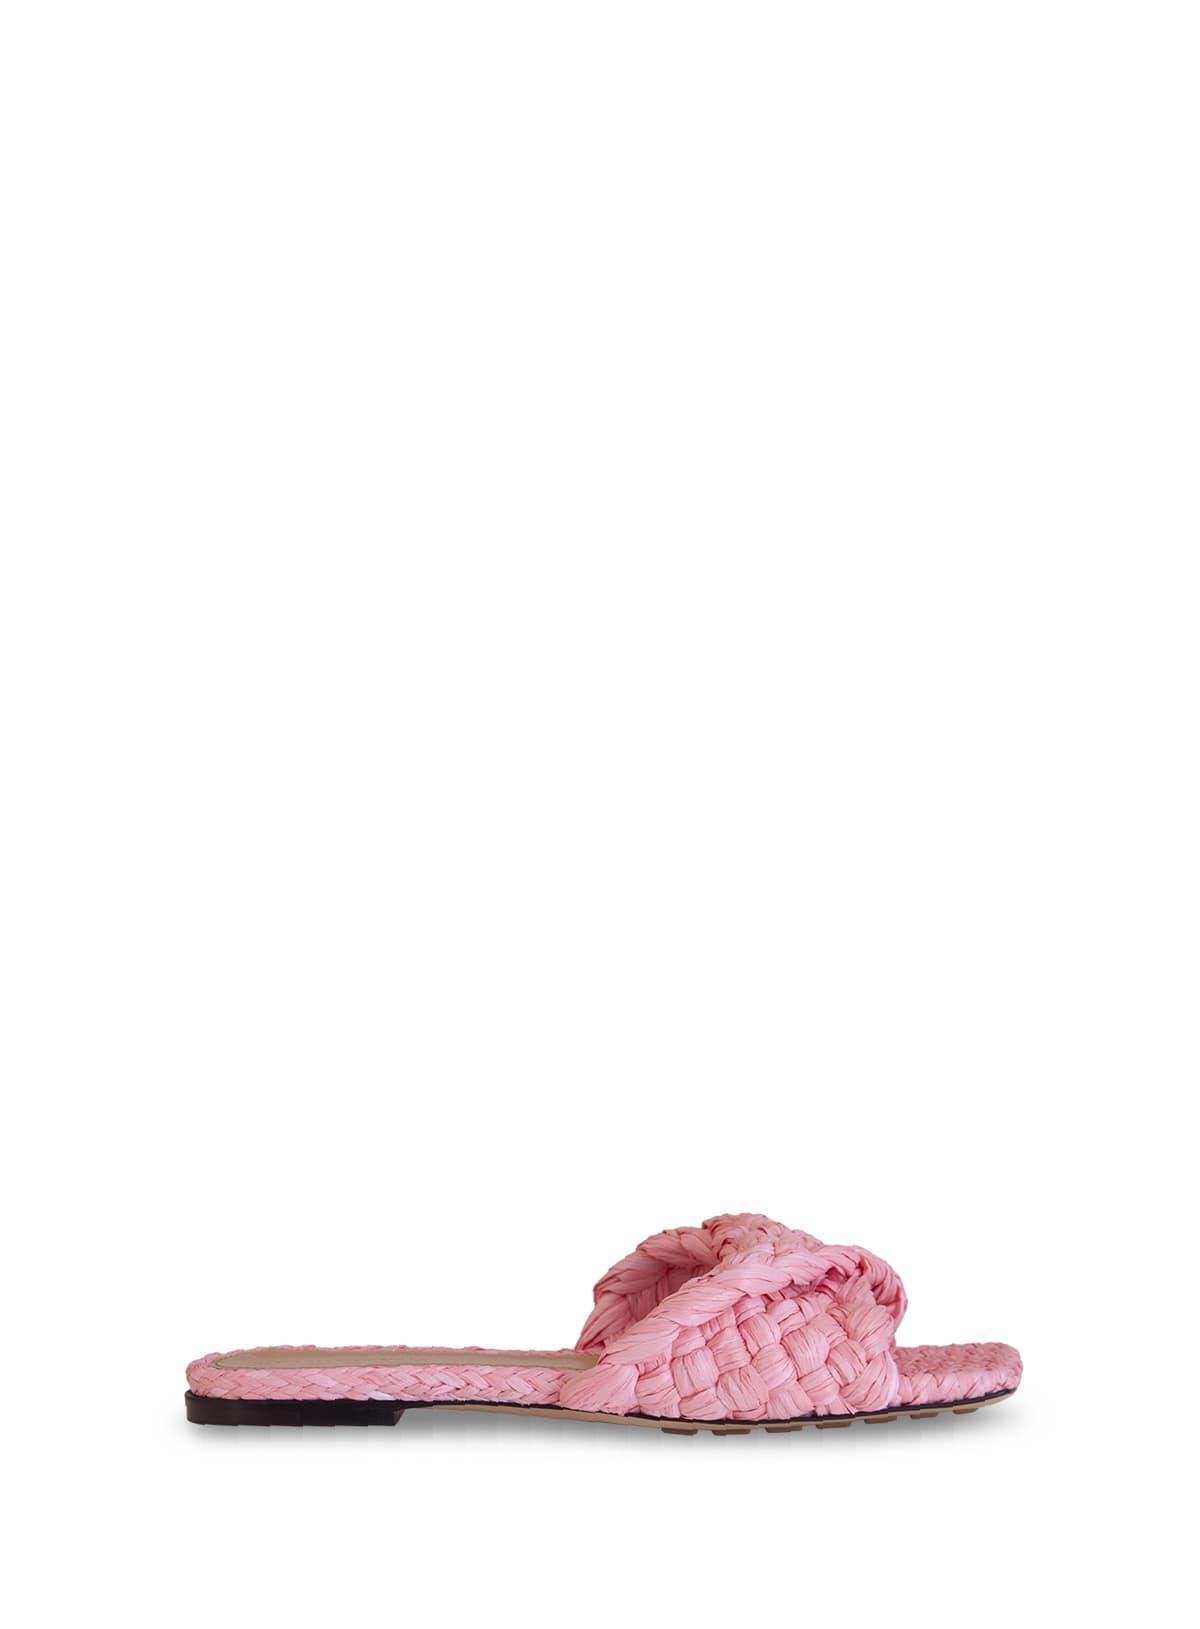 Buy Bottega Veneta Flat Shoes online, shop Bottega Veneta shoes with free shipping